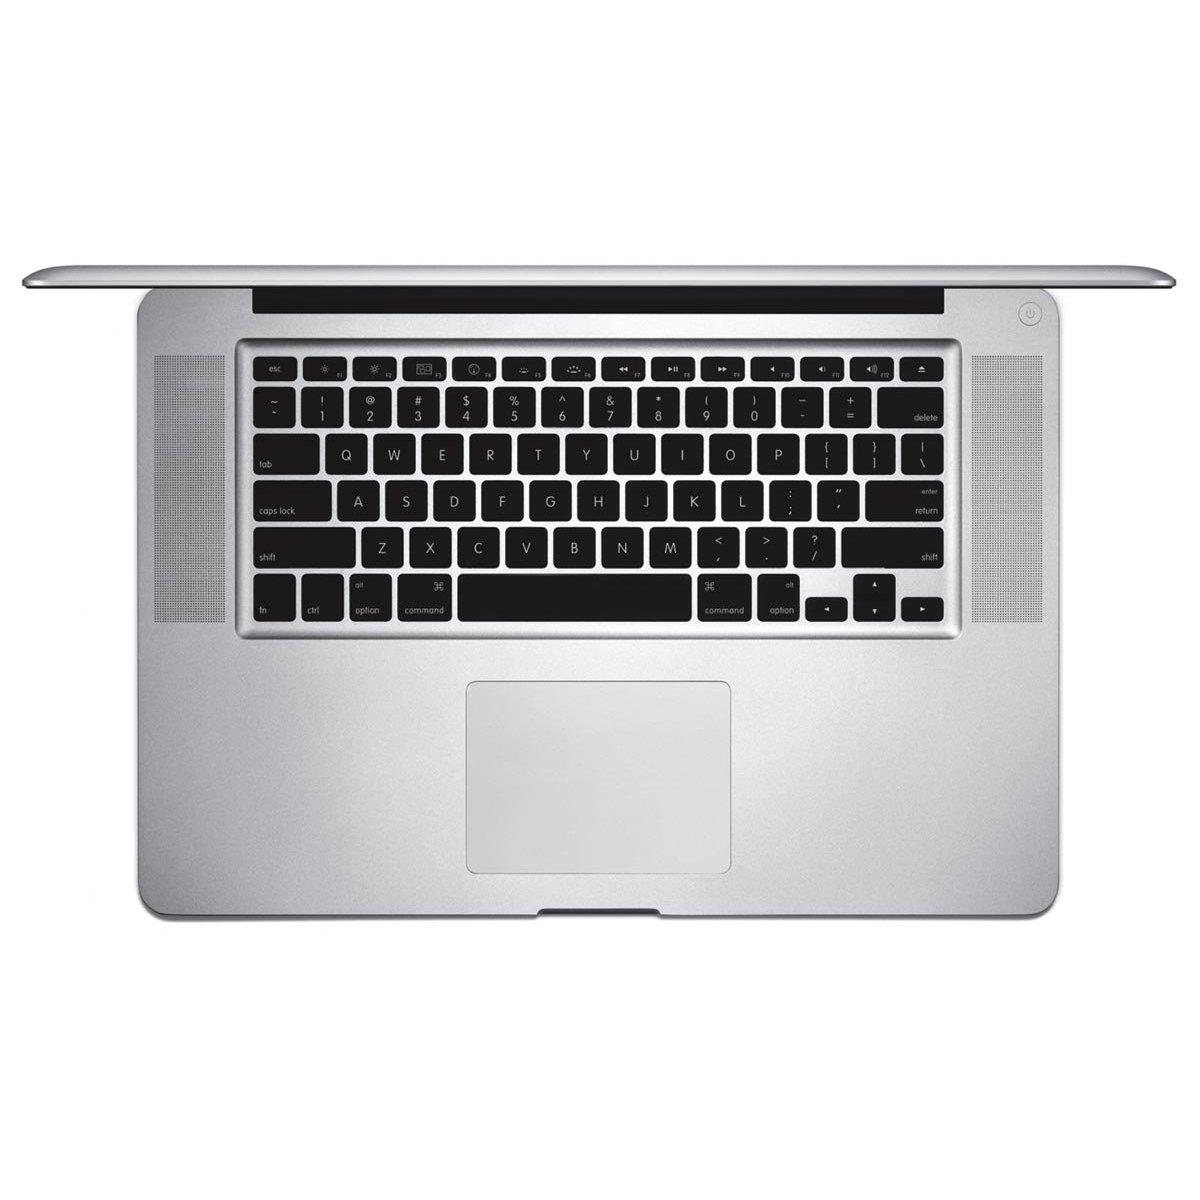 "MacBook Pro 15"" Retina (2012) - Core i7 2,3 GHz - SSD 512 GB - 16GB - QWERTY - Spanisch"